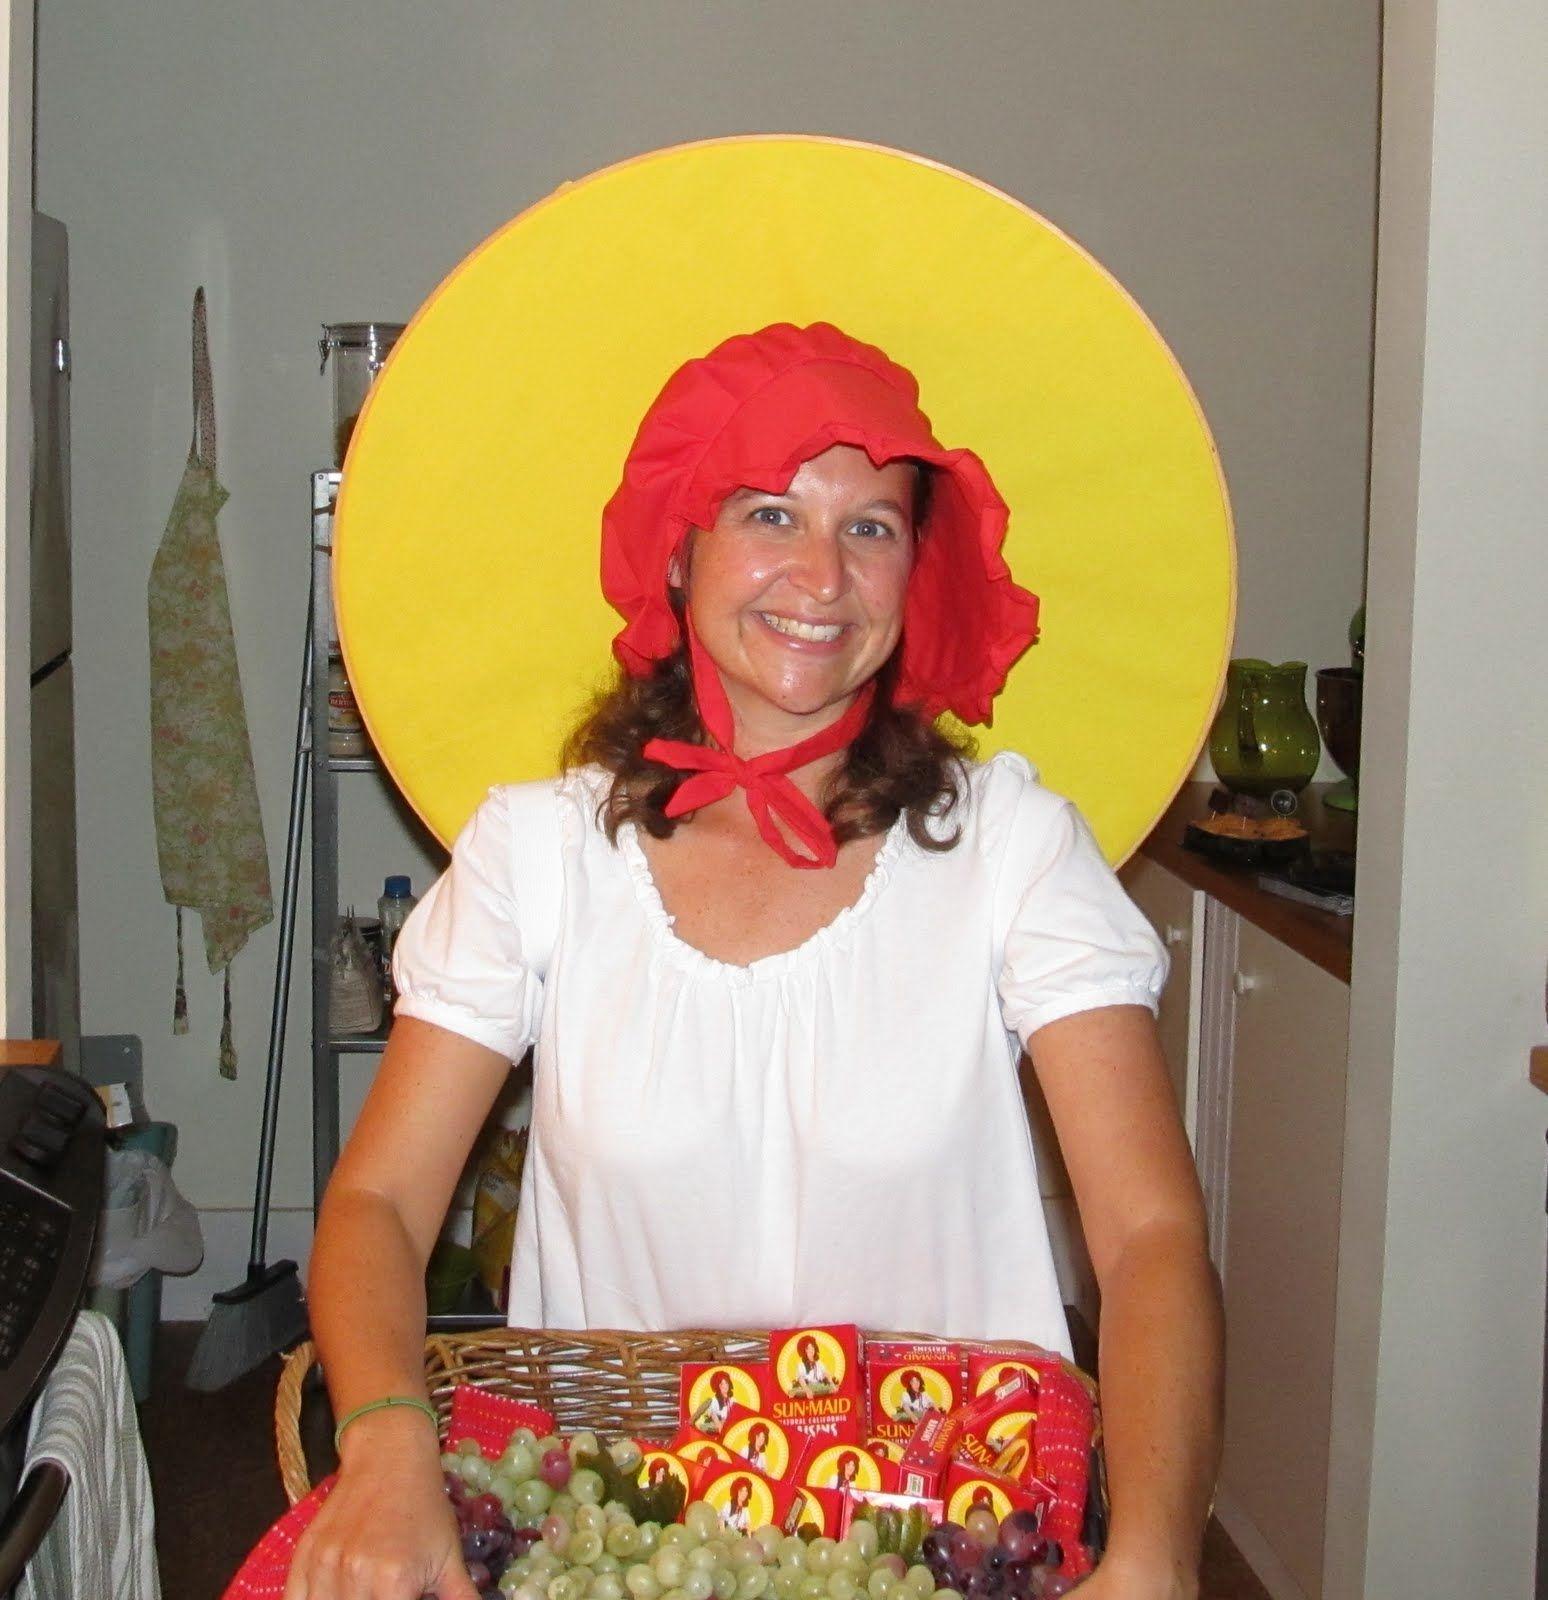 Sun-Maid Raisin box | Costume Ideas | Pinterest | Costumes and ...